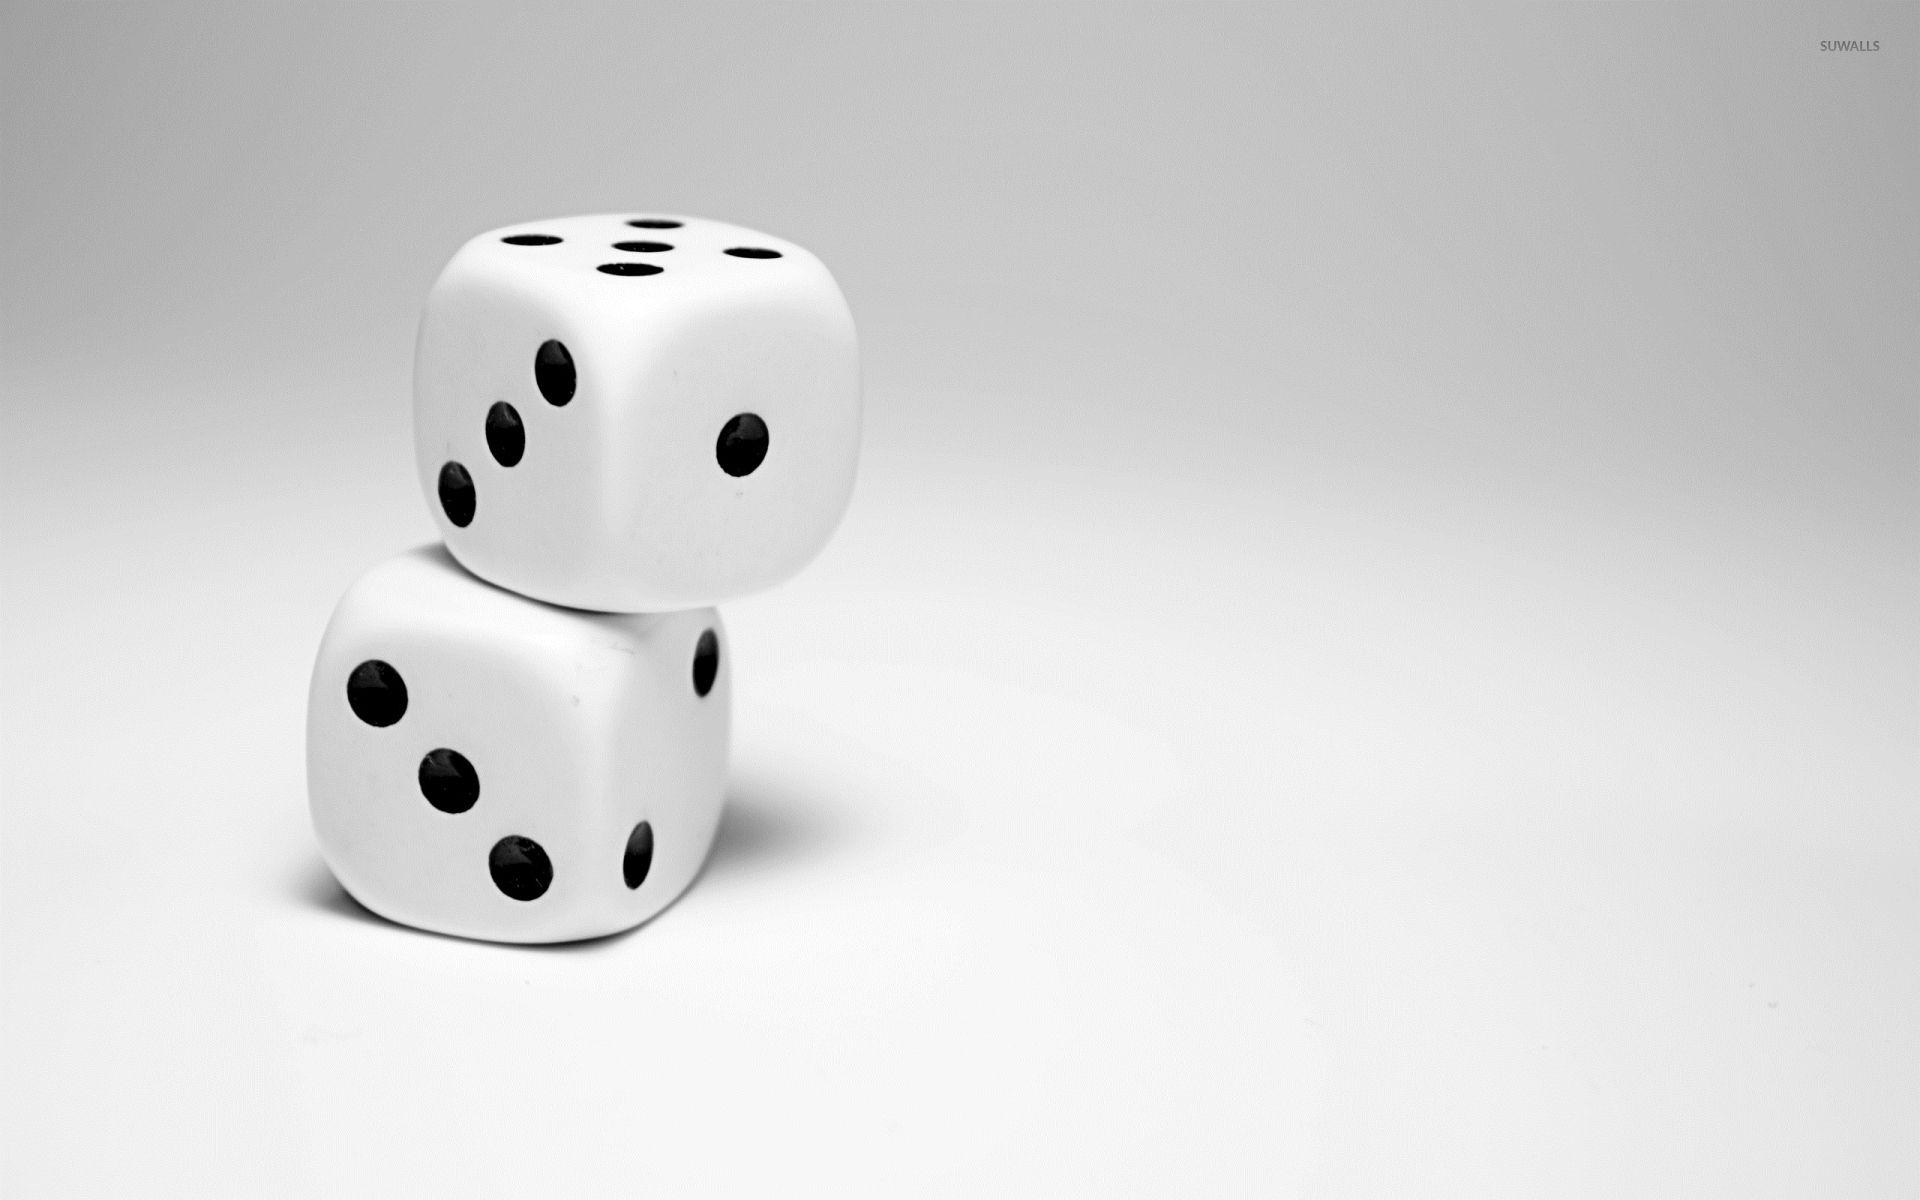 dice wallpaper for phone